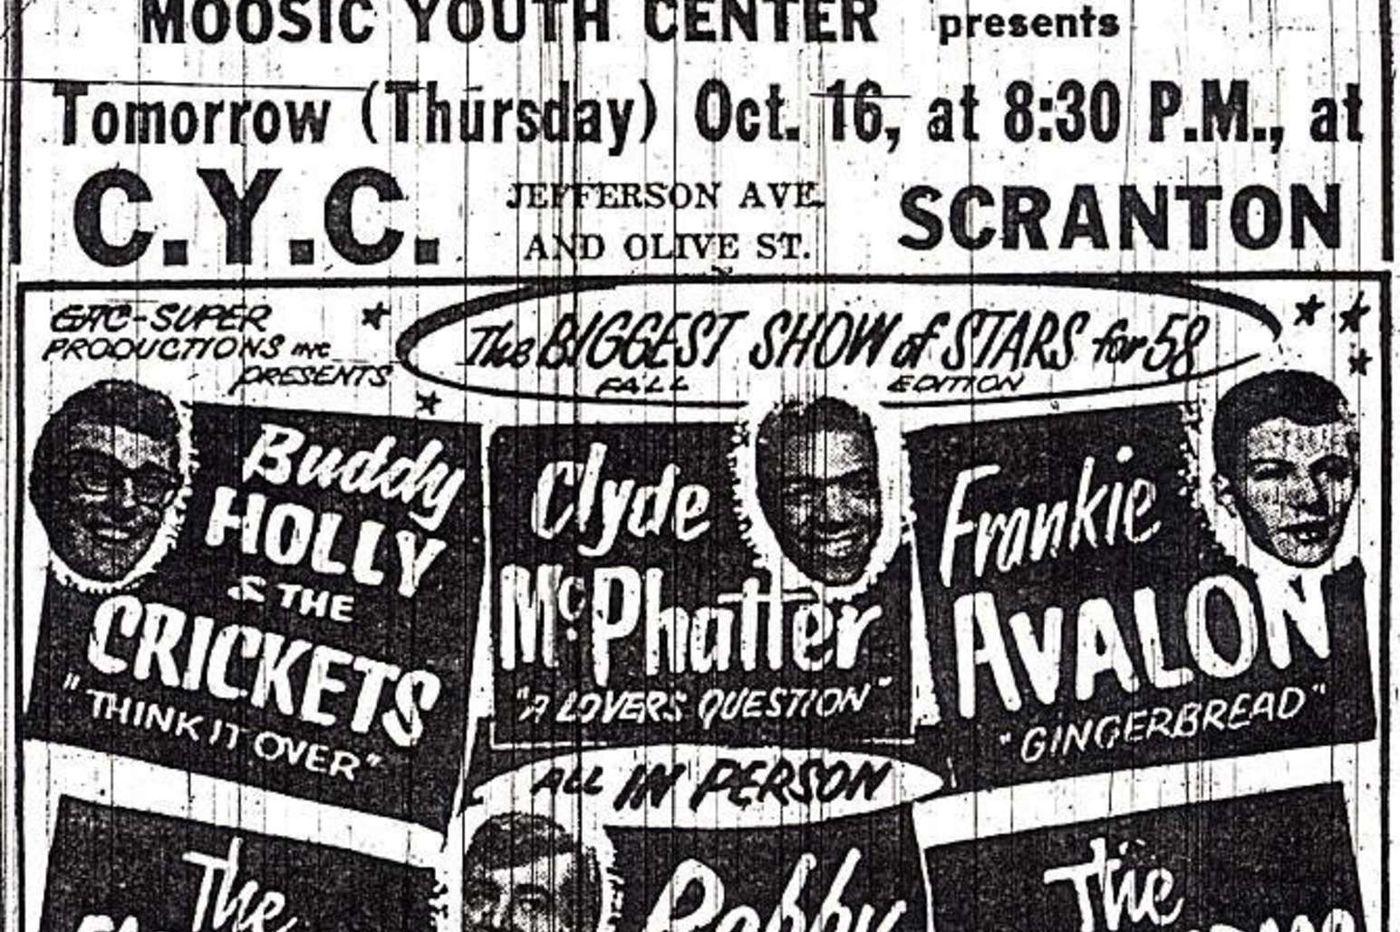 Buddy Holly's Philadelphia story